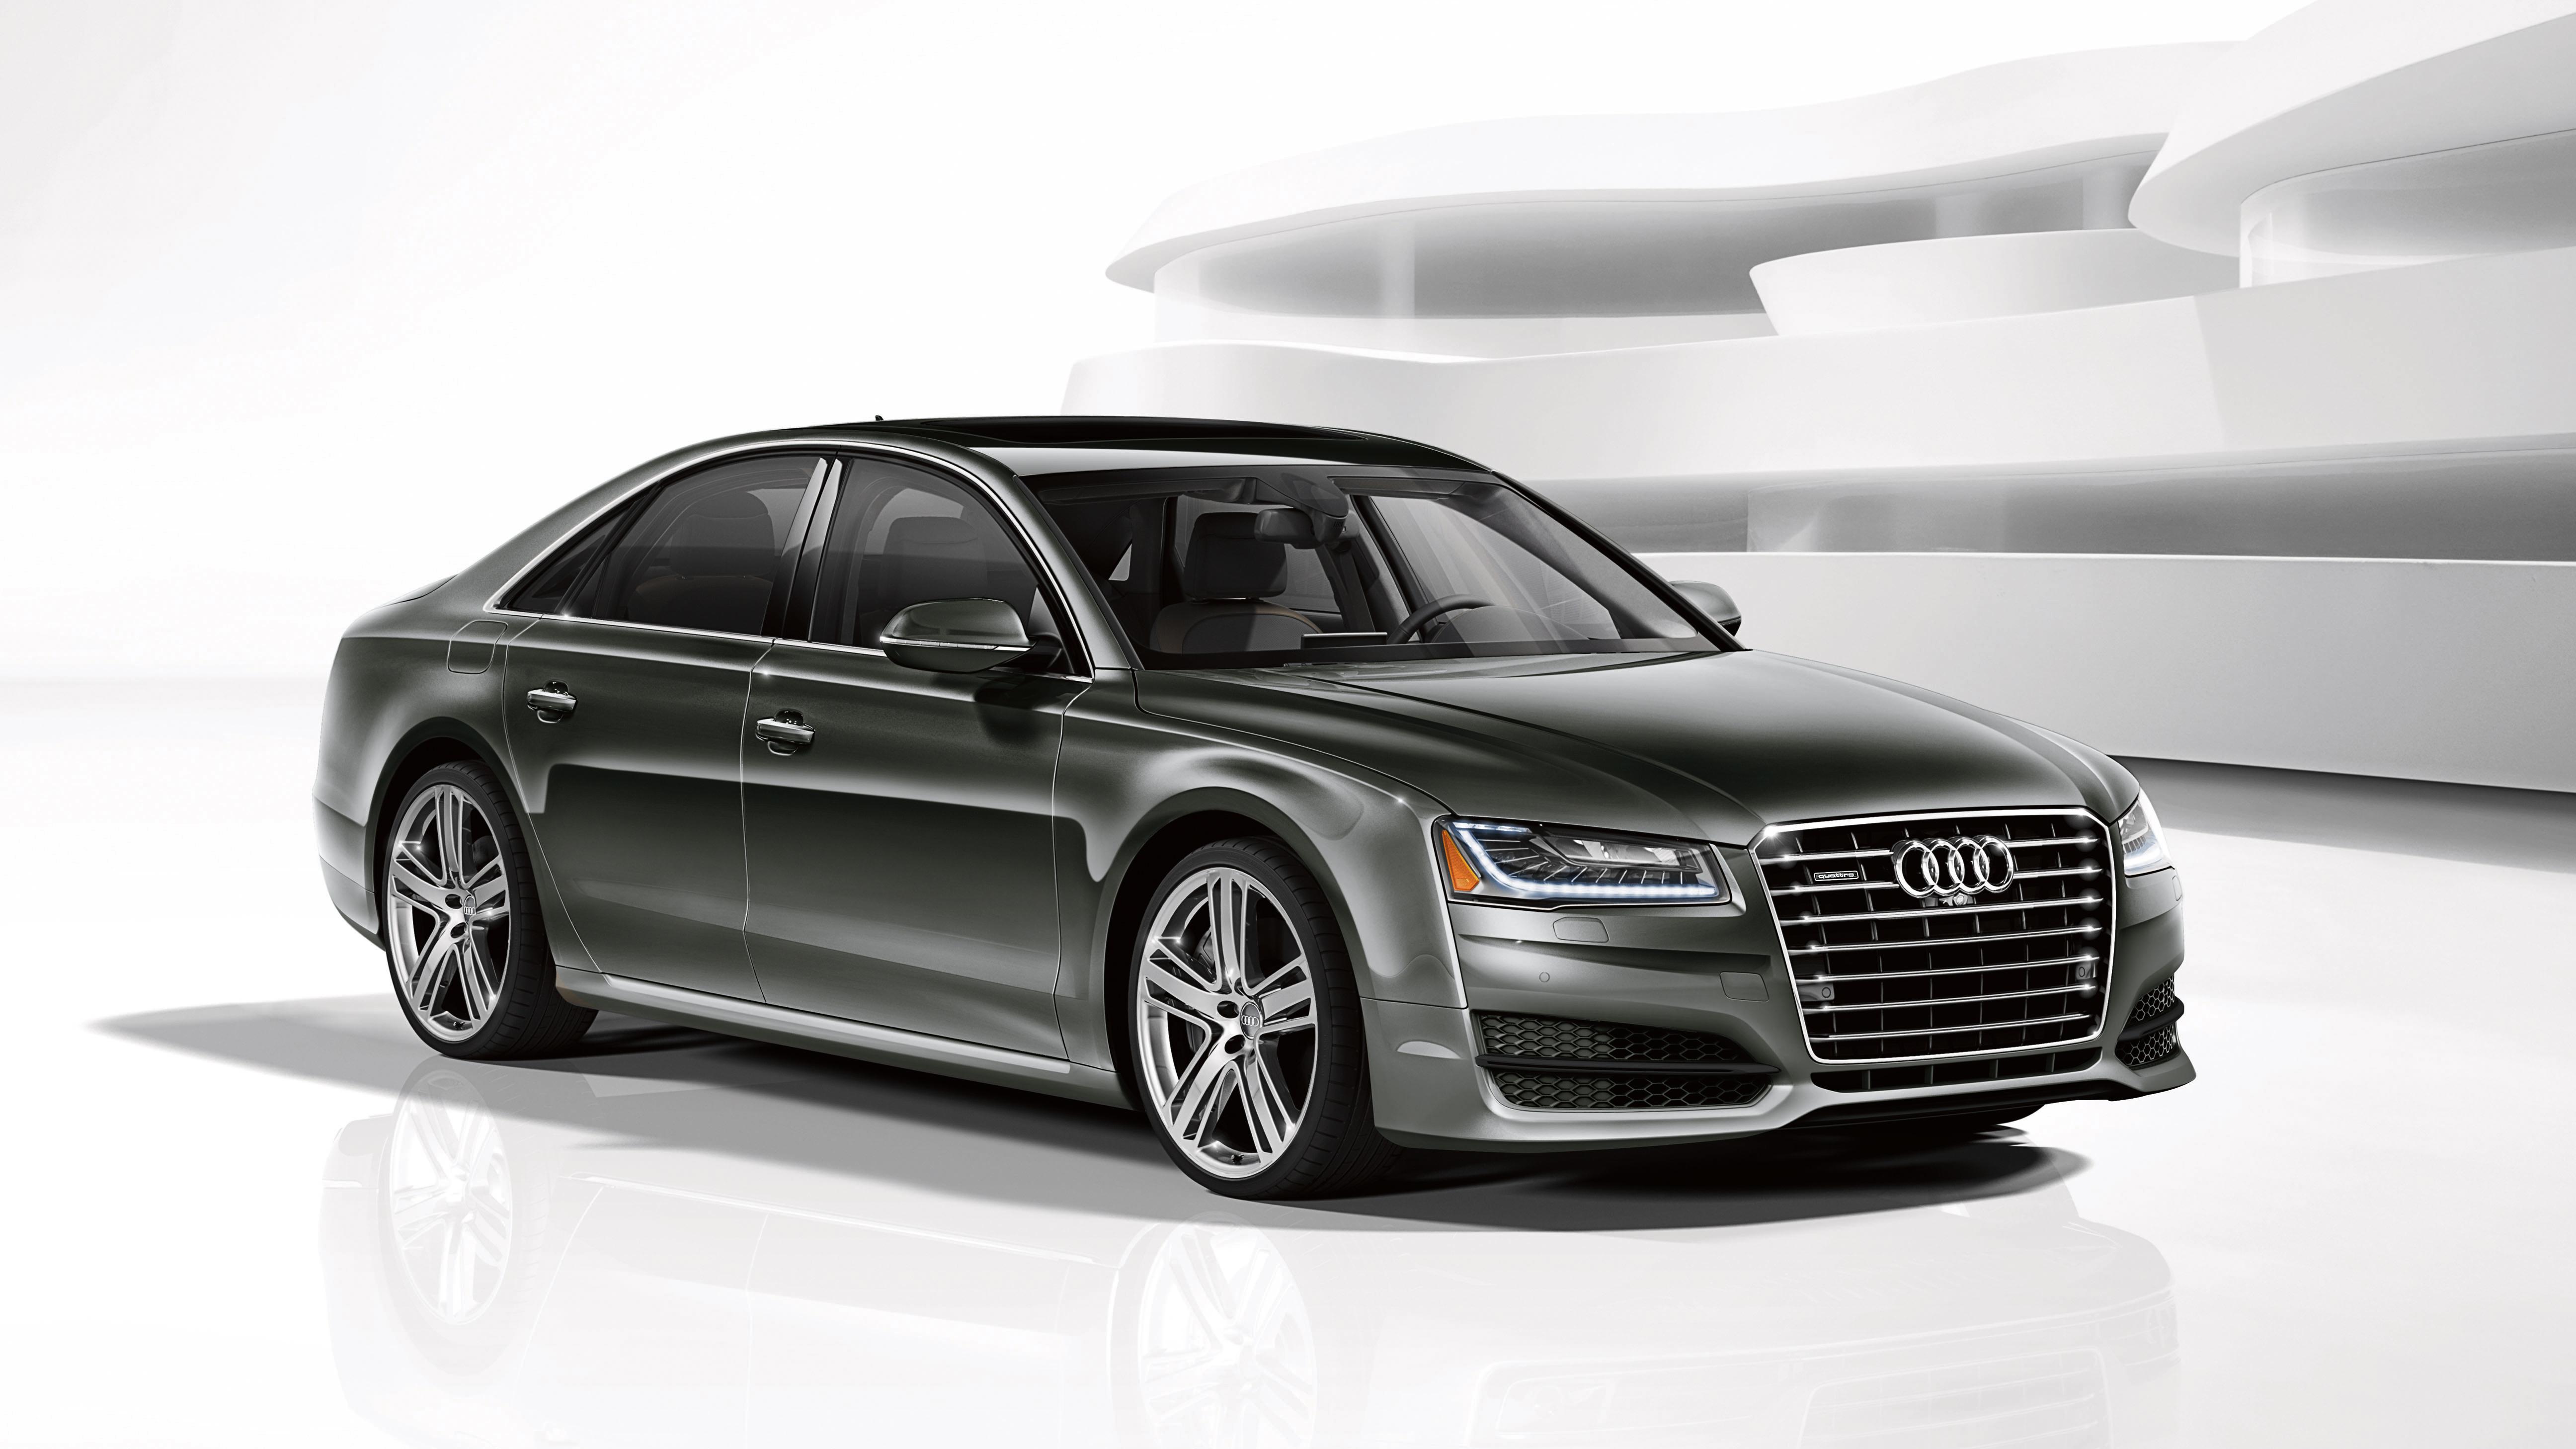 Audi Introduces A L T Sport Model Business Wire - Audi usa models